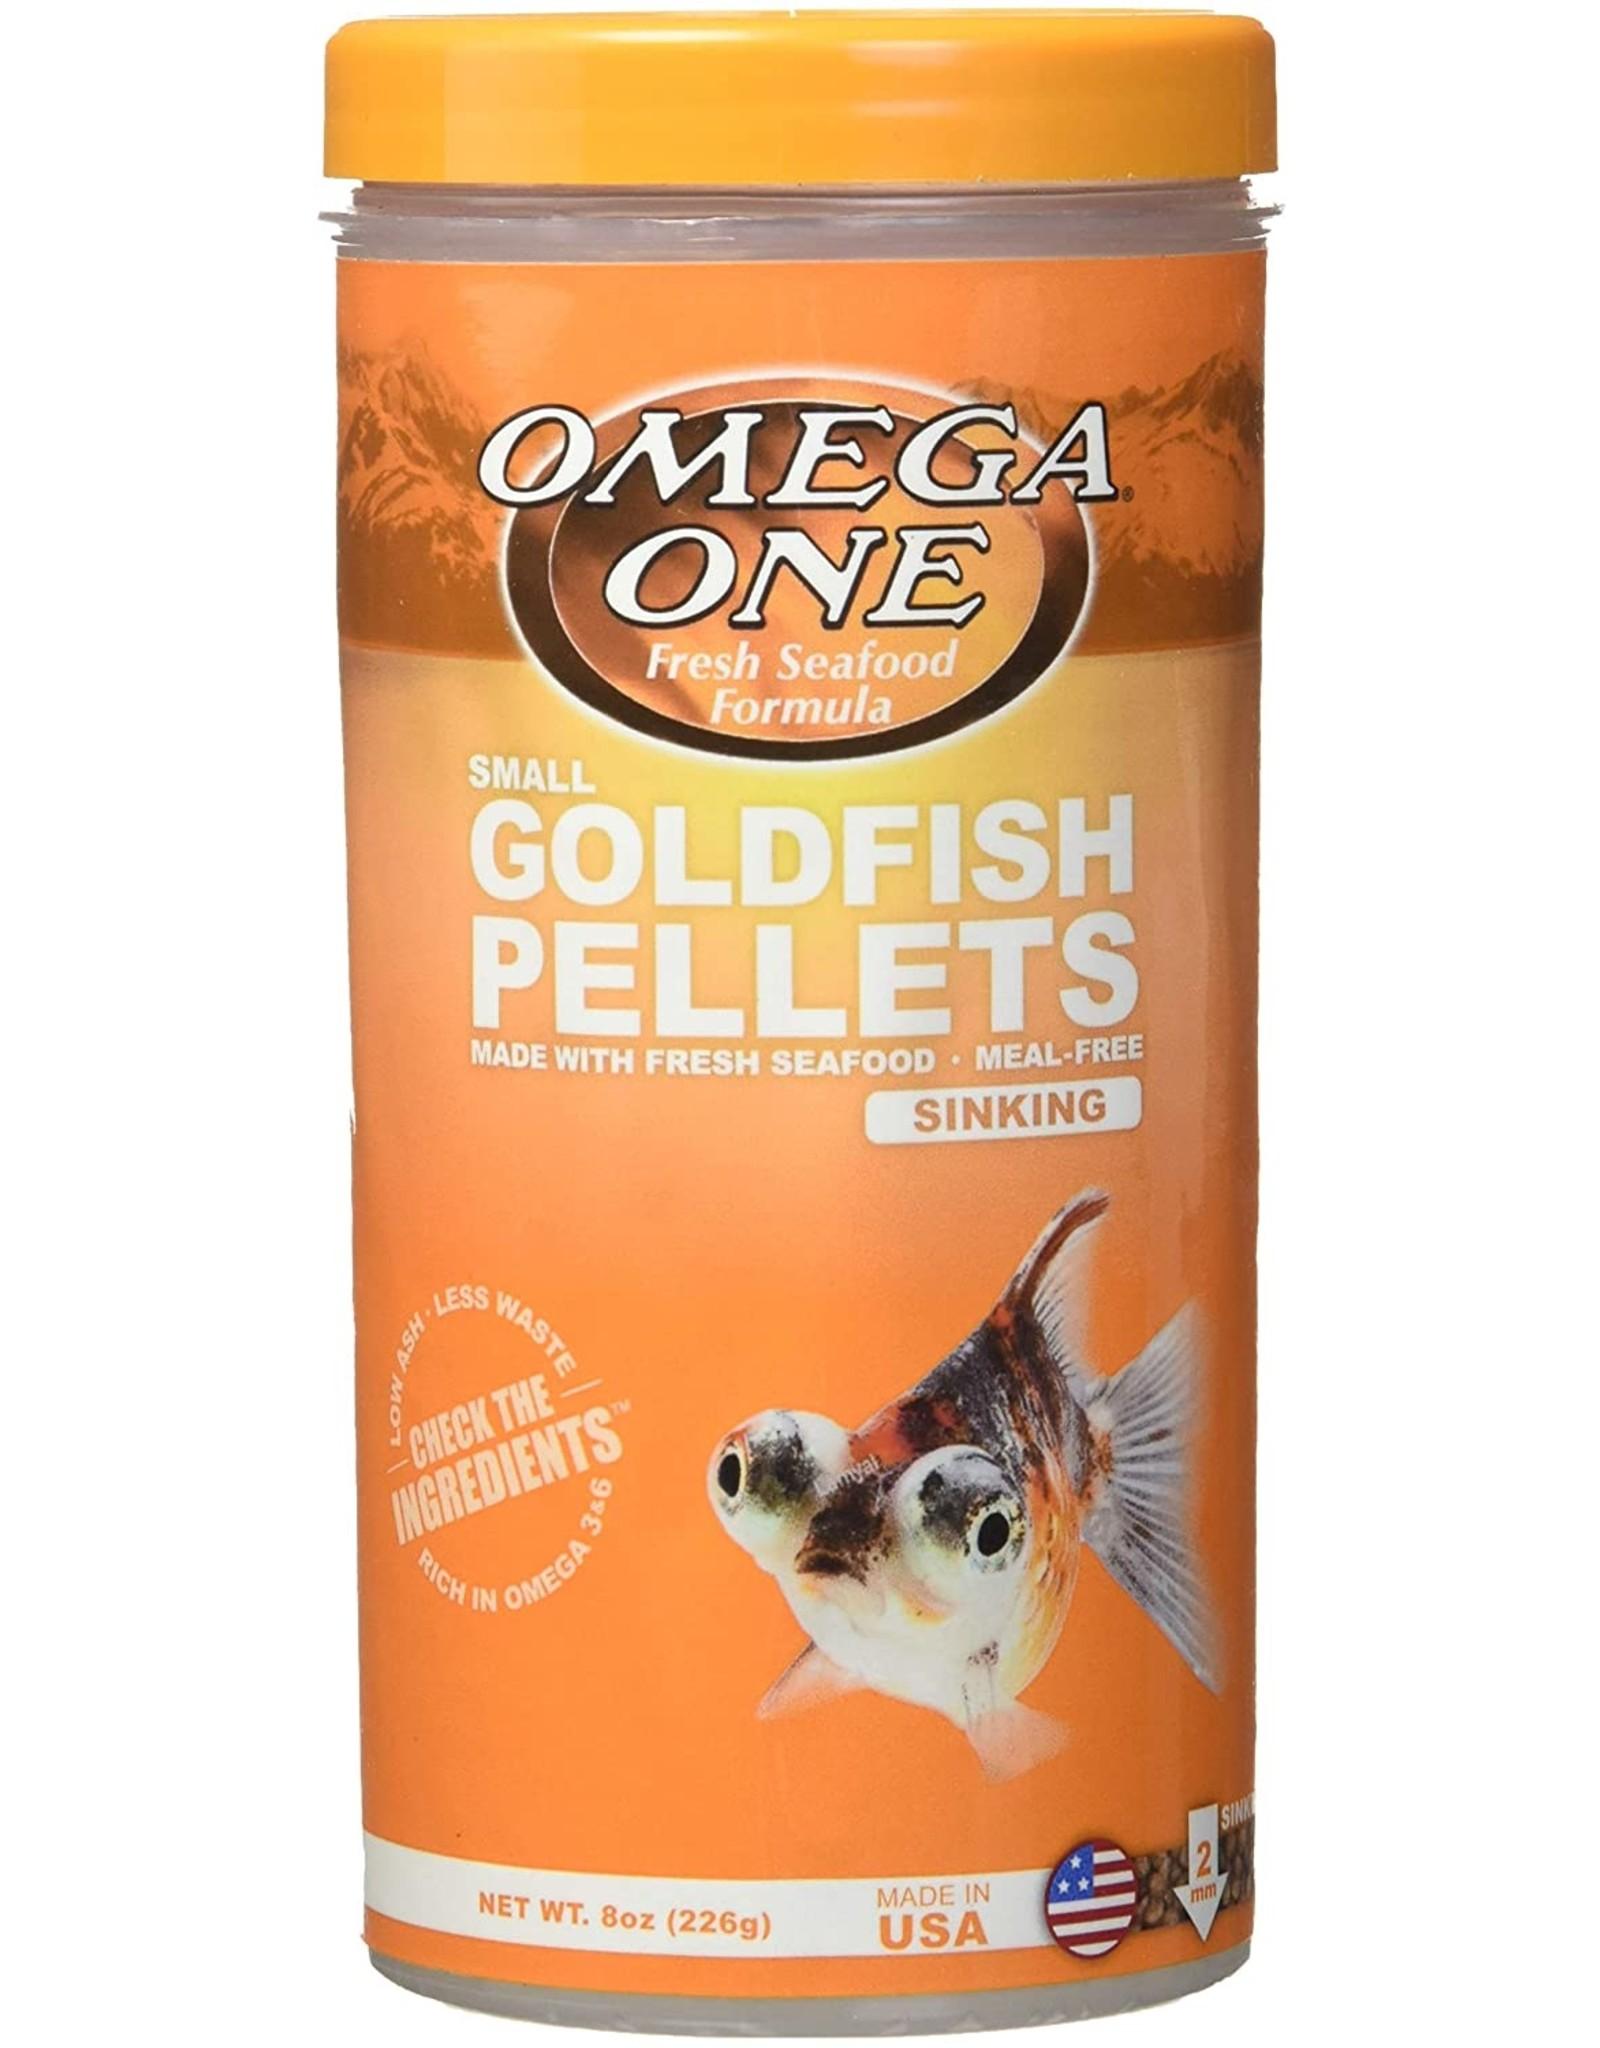 Omega One Food OMEGA ONE Goldfish Pellets